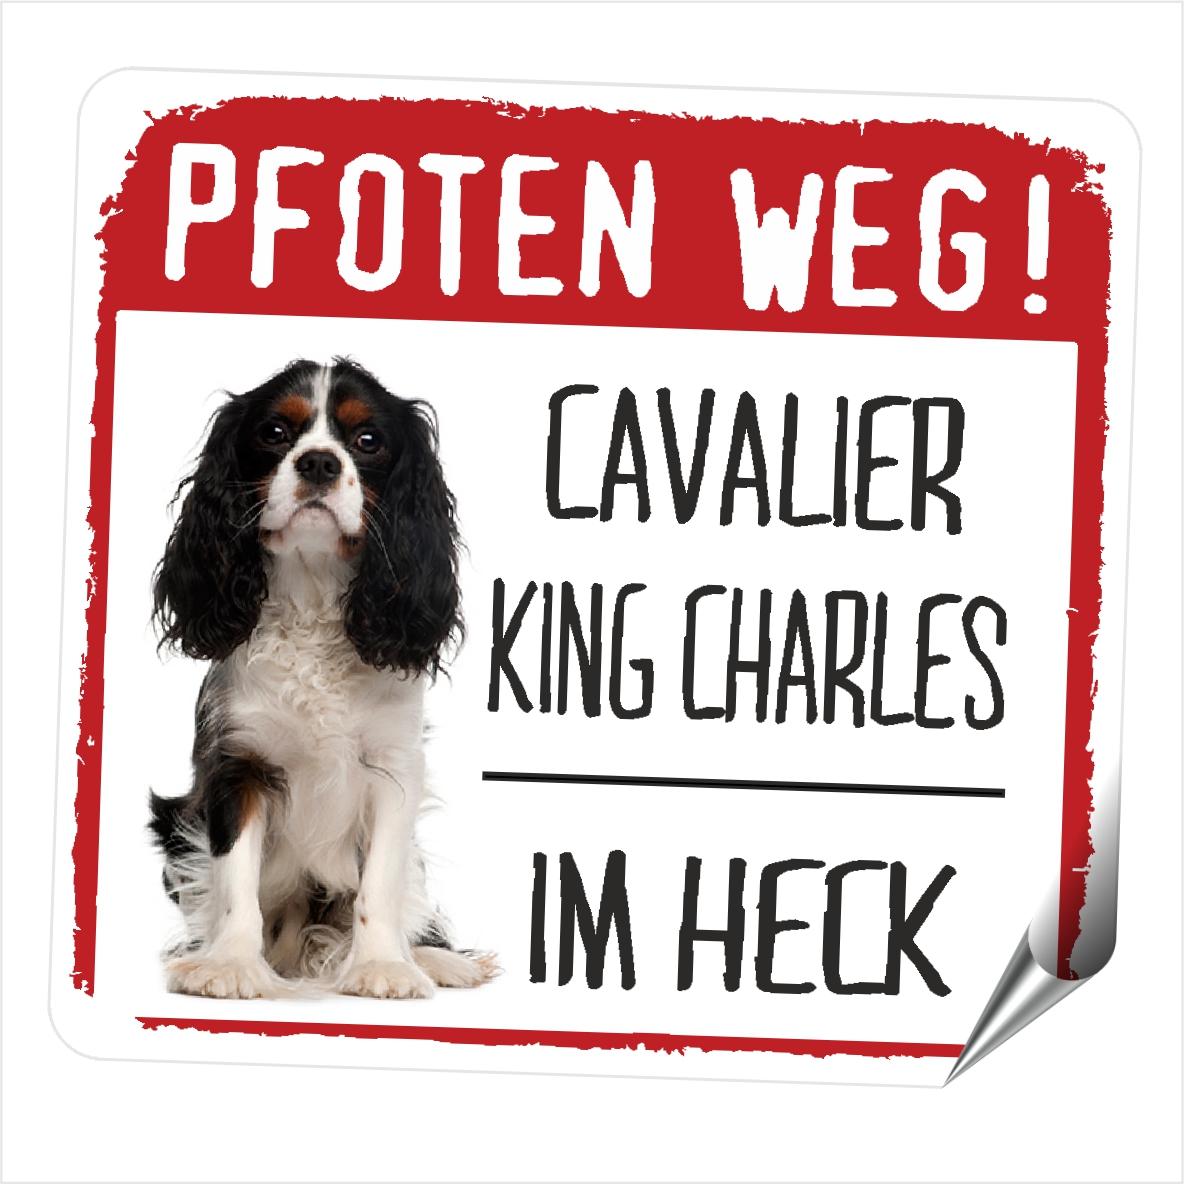 512d974fb7 Siviwonder Shop | Cavalier King Charles Spaniel PFOTEN WEG | online ...